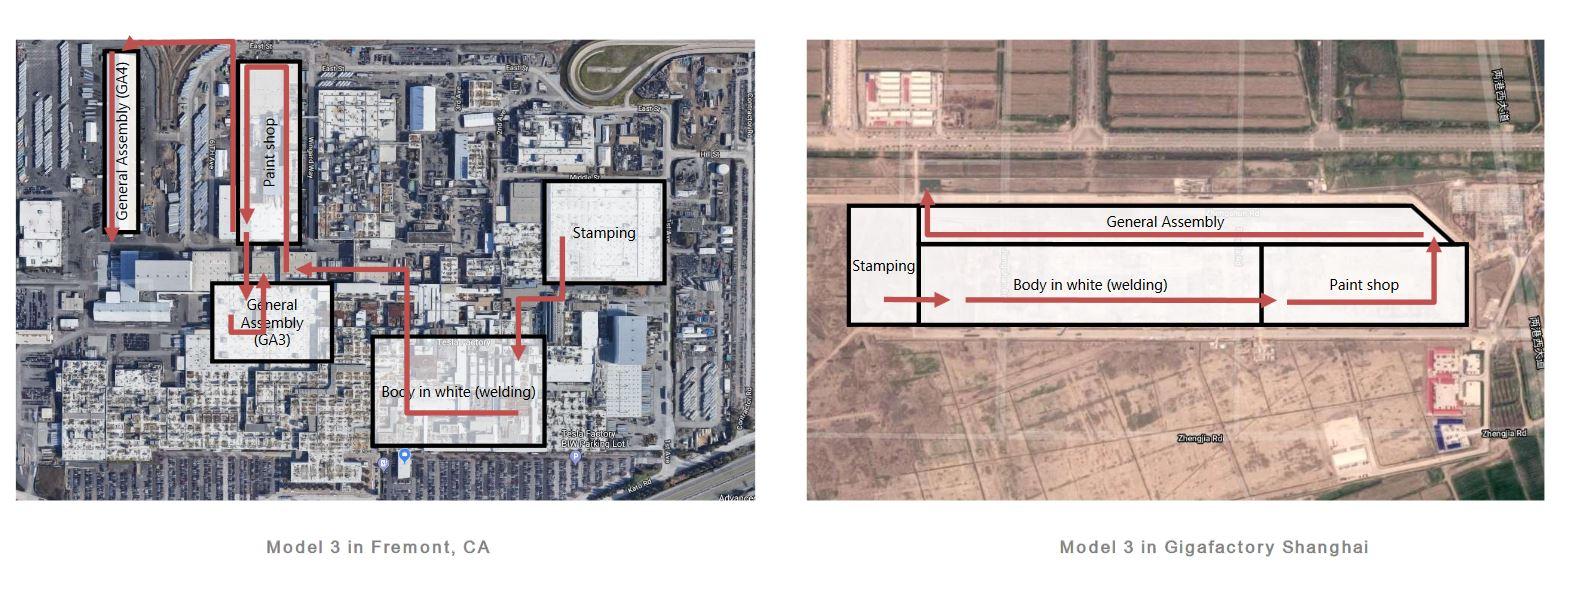 Tesla Fremont Factory and Gigafactory Shanghai